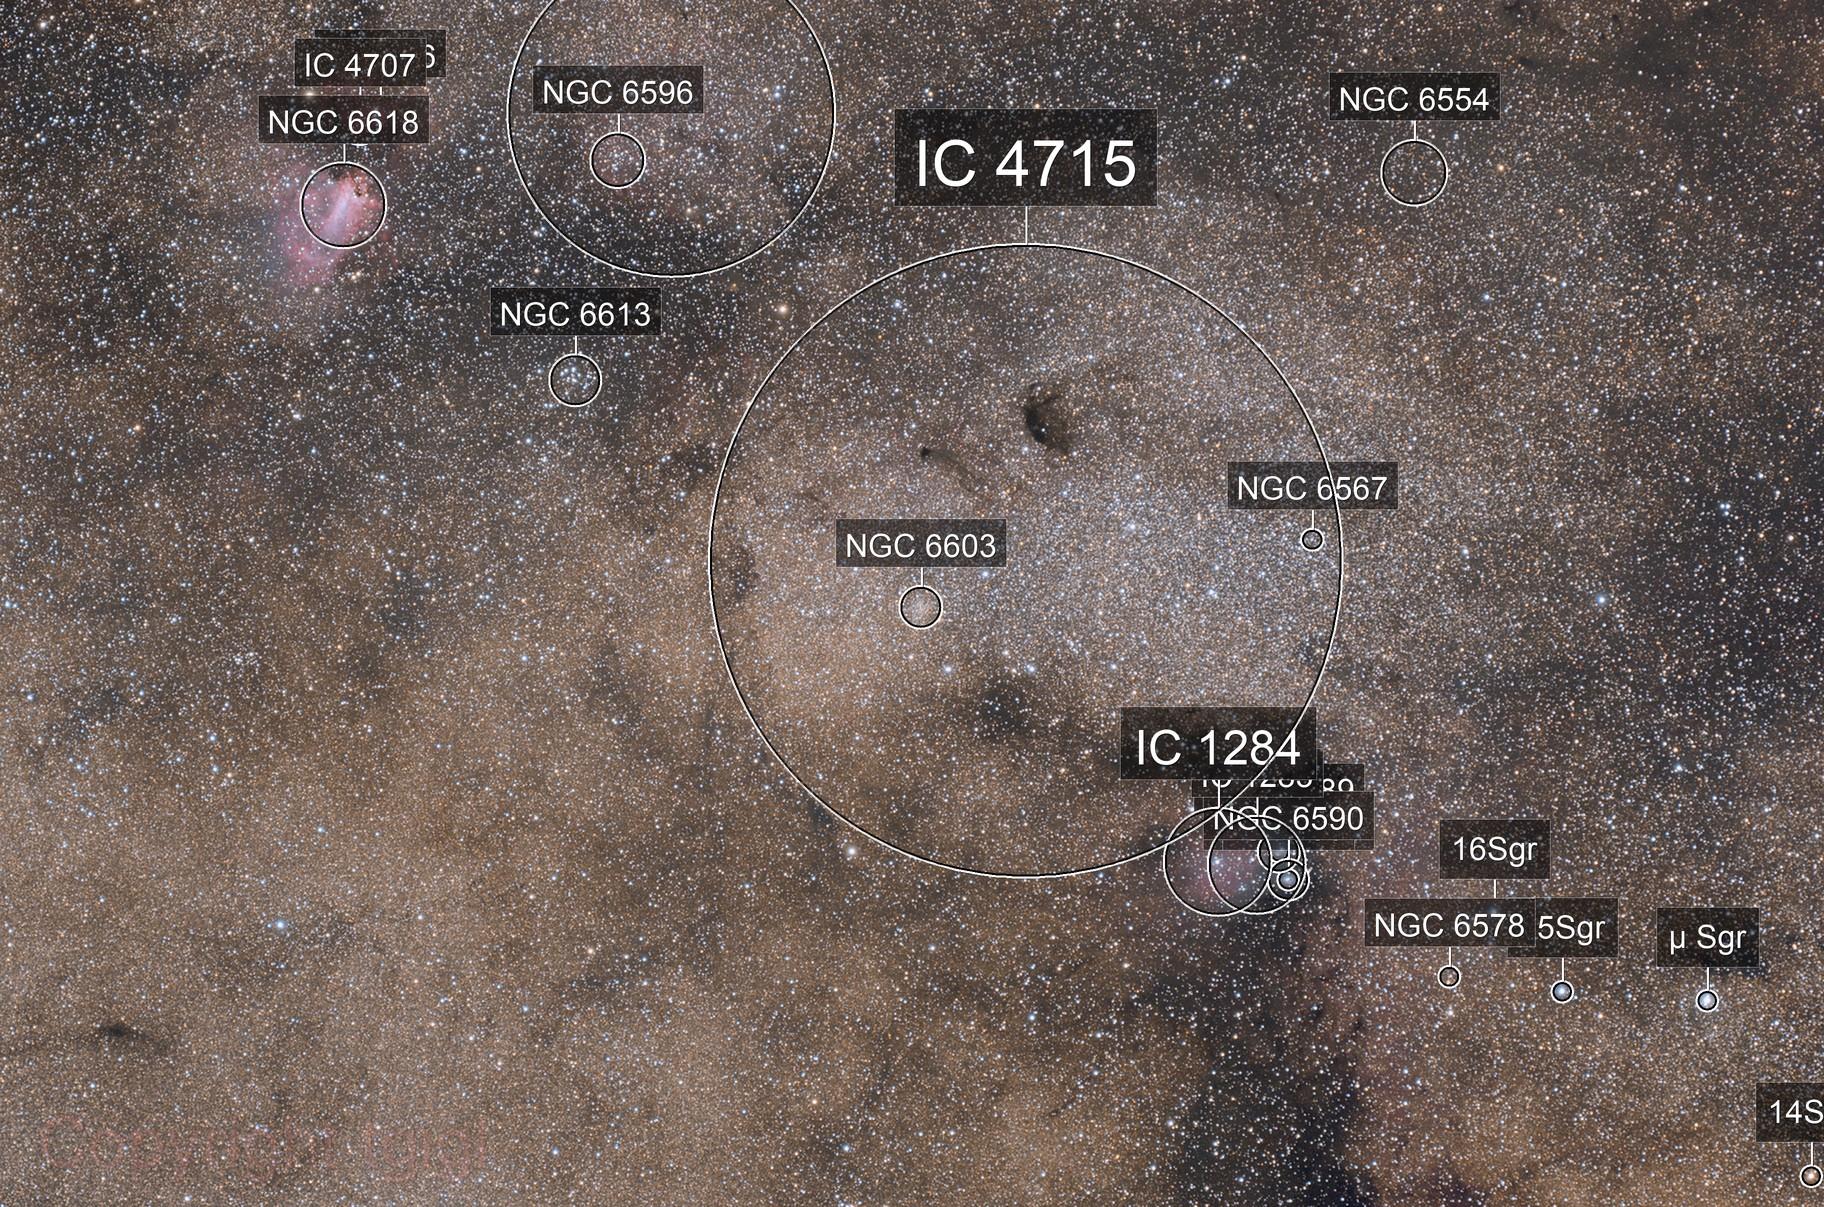 Sagittarius Star Cloud - Messier 24